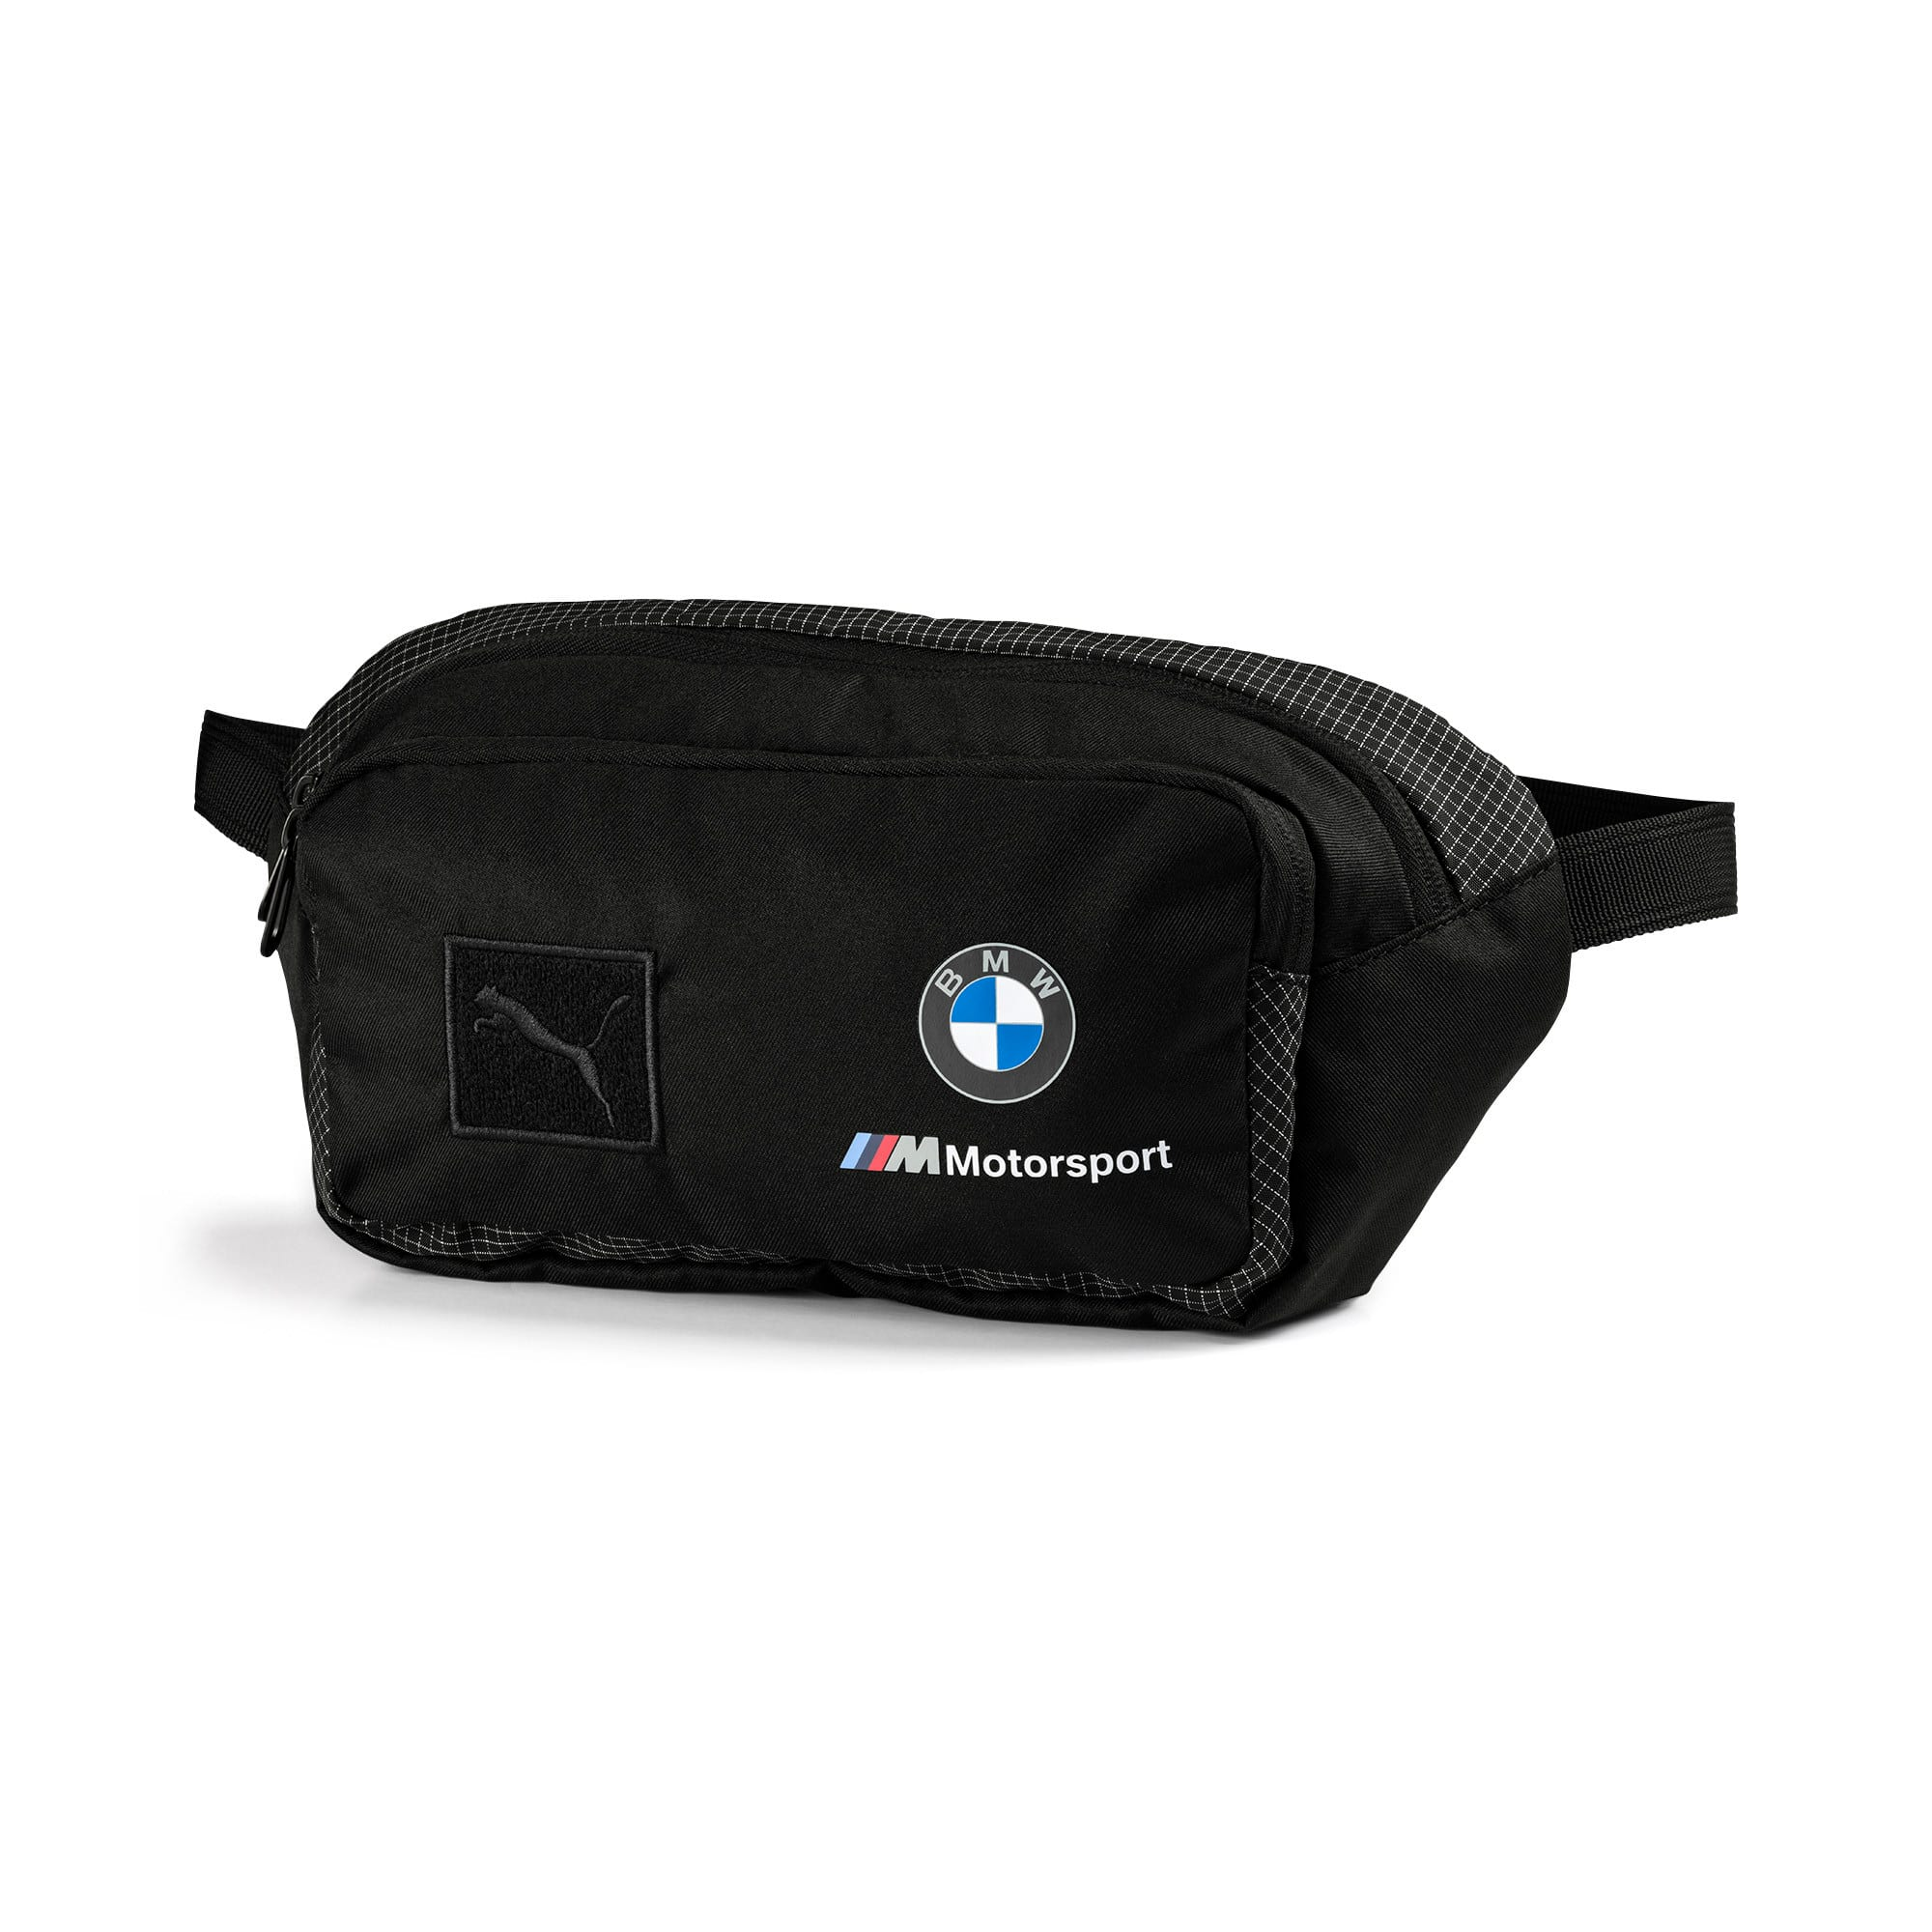 Miniatura 1 de Bolso pequeño para cintura BMW M Motorsport, Puma Black, mediano